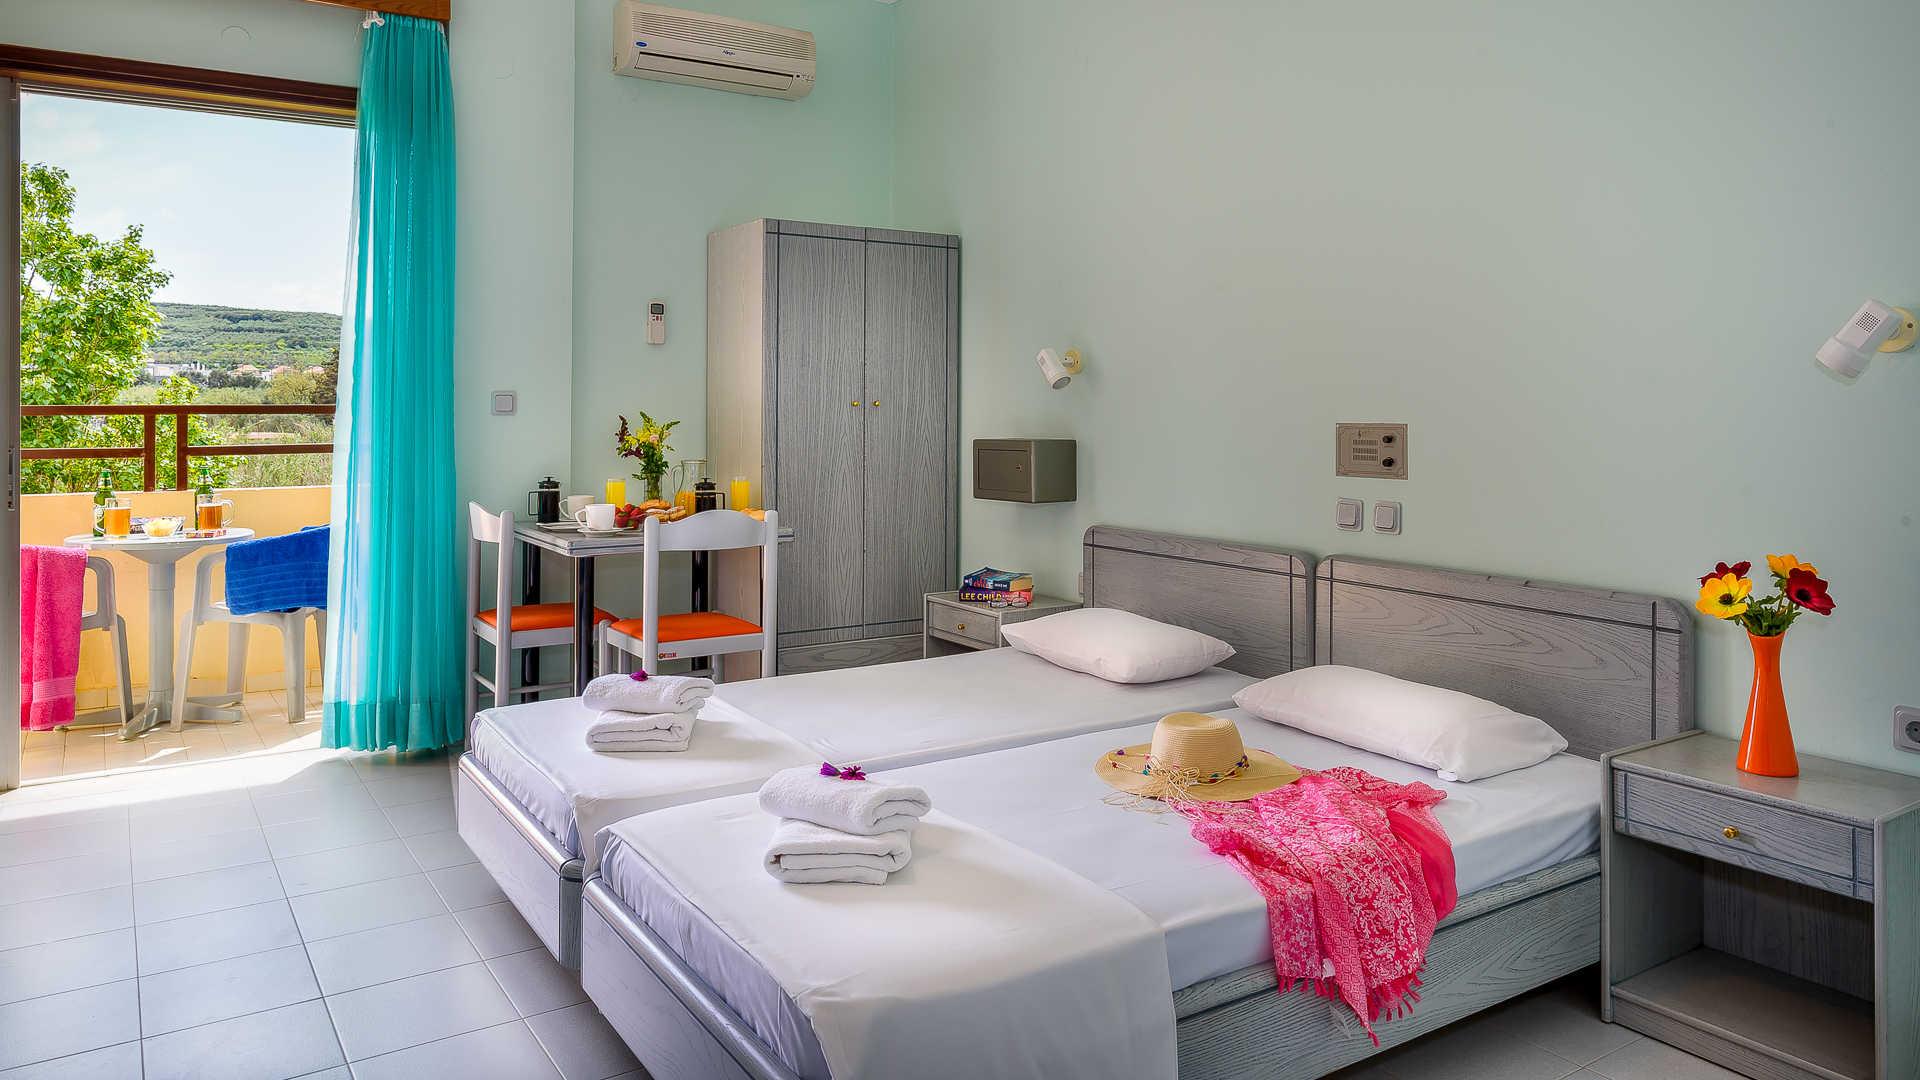 http://louladakis-apts.gr/wp-content/uploads/2017/04/louladakis_apts_vacations_chania.jpg